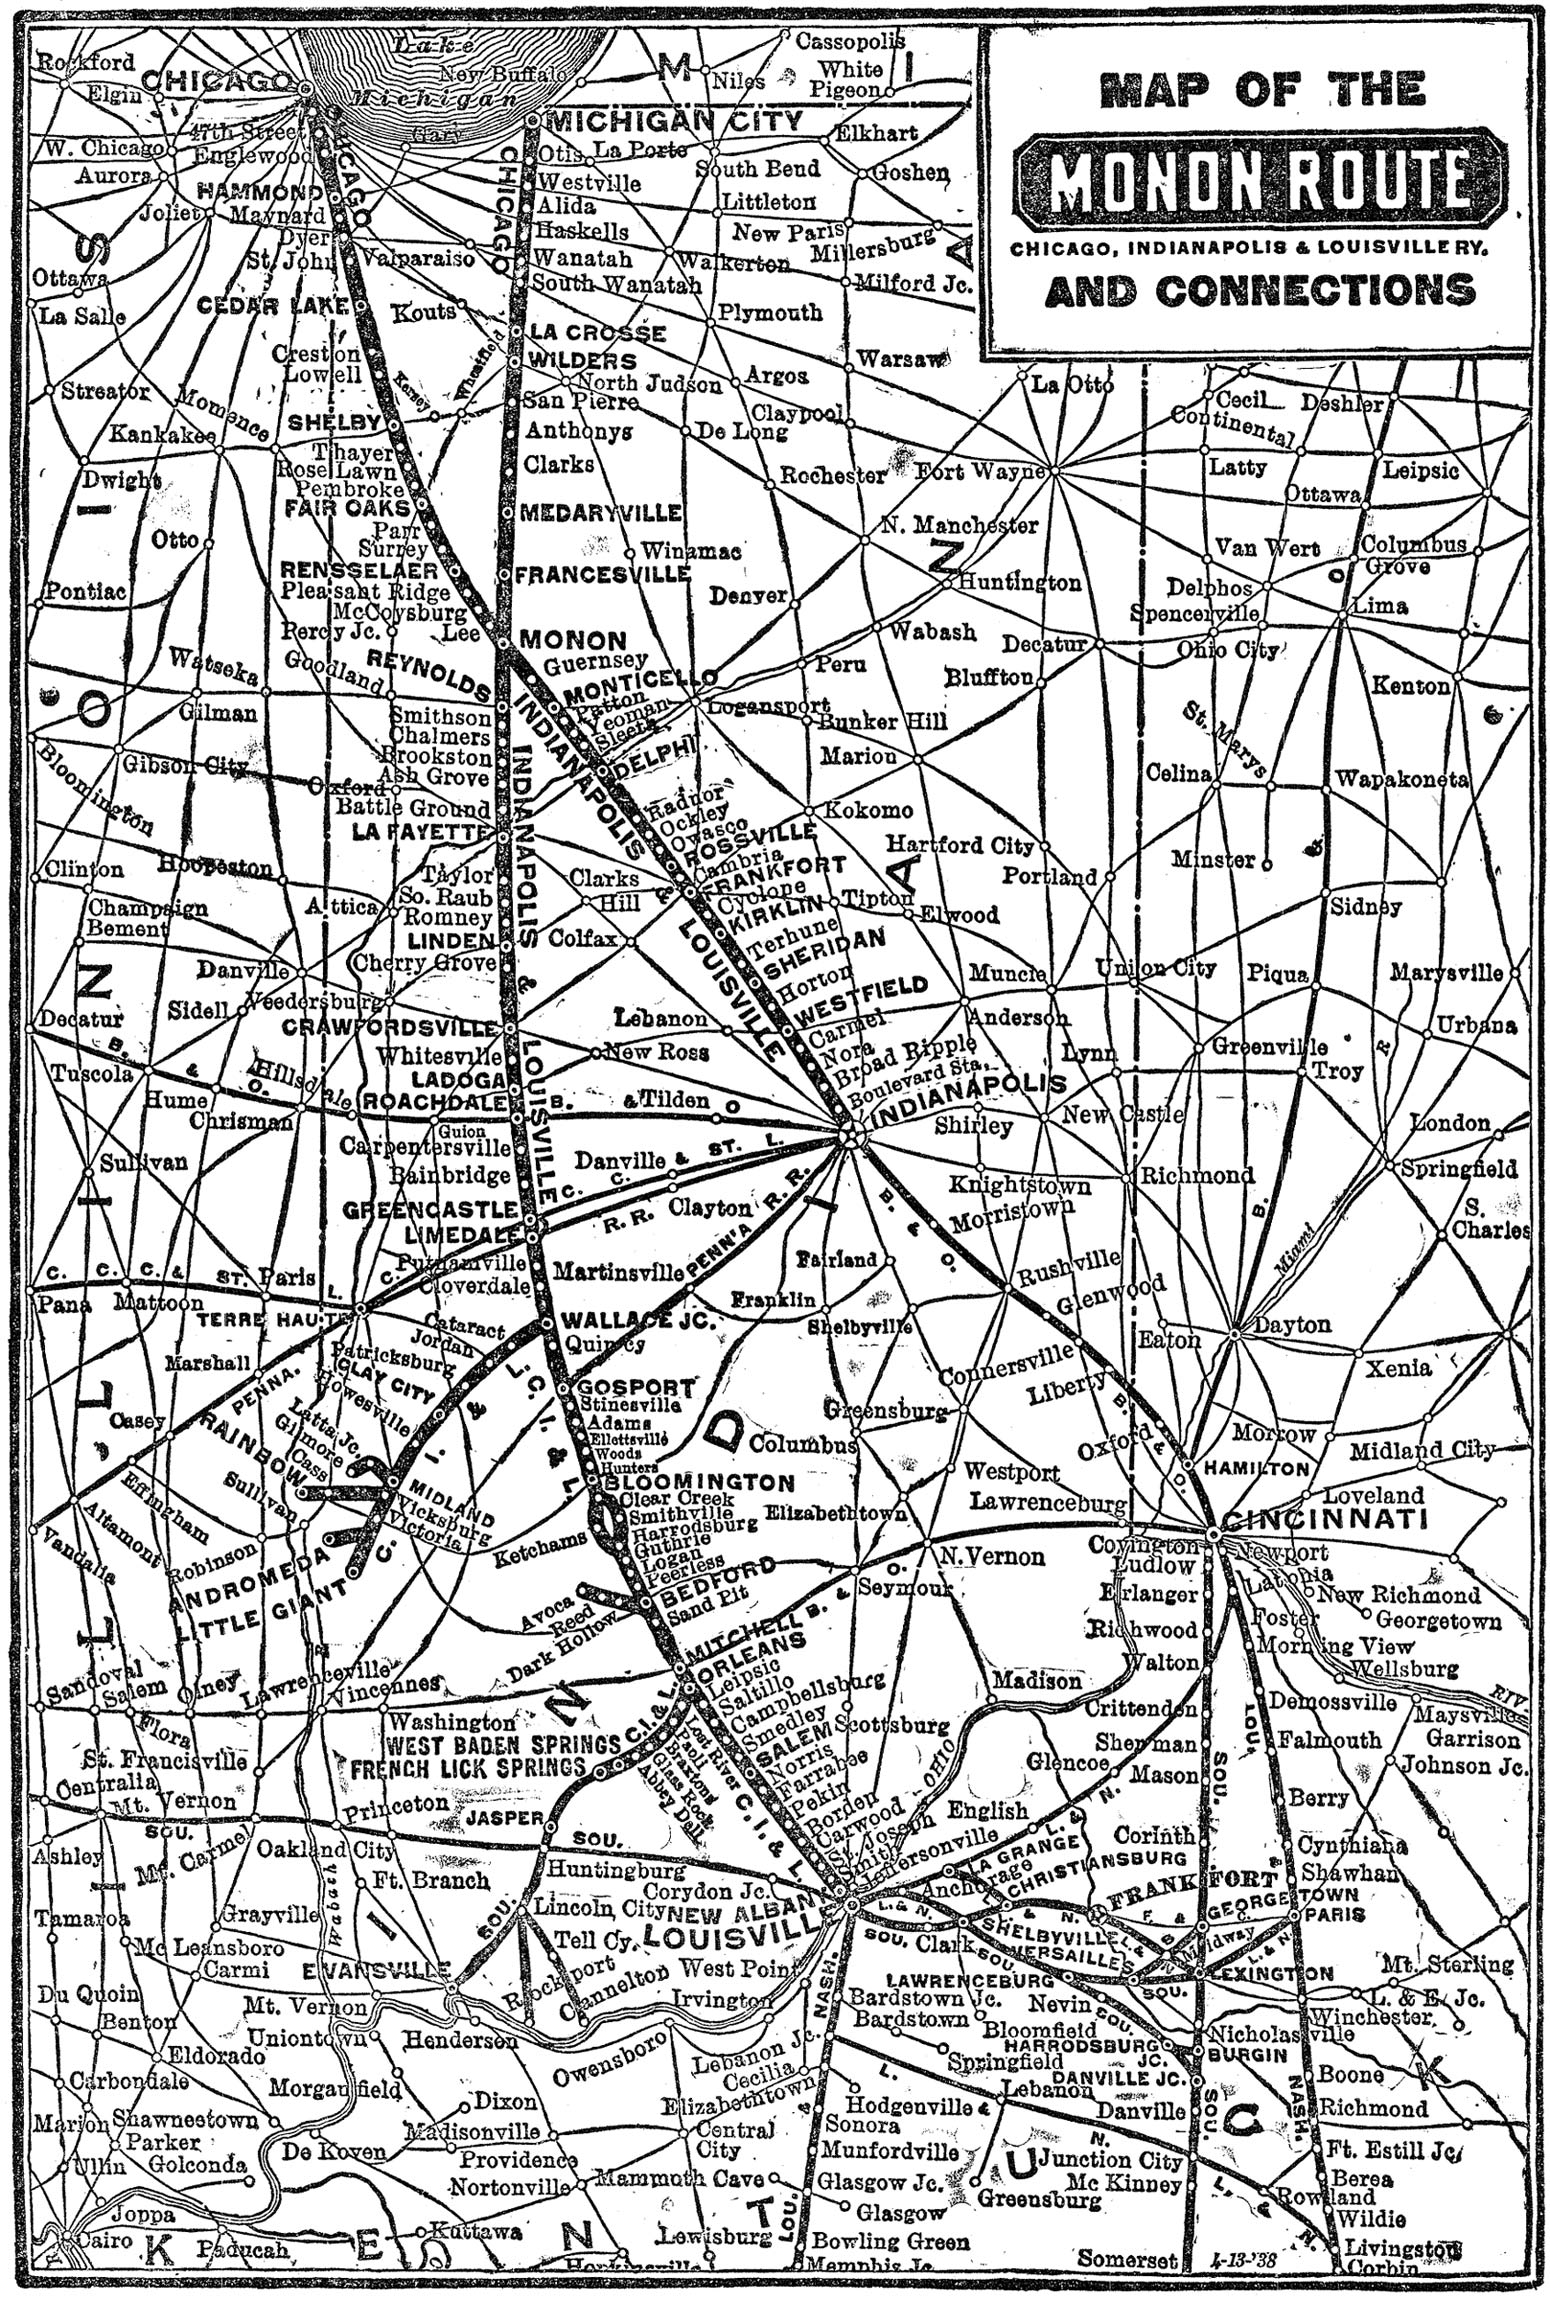 The Monon Railroad The Hoosier Line